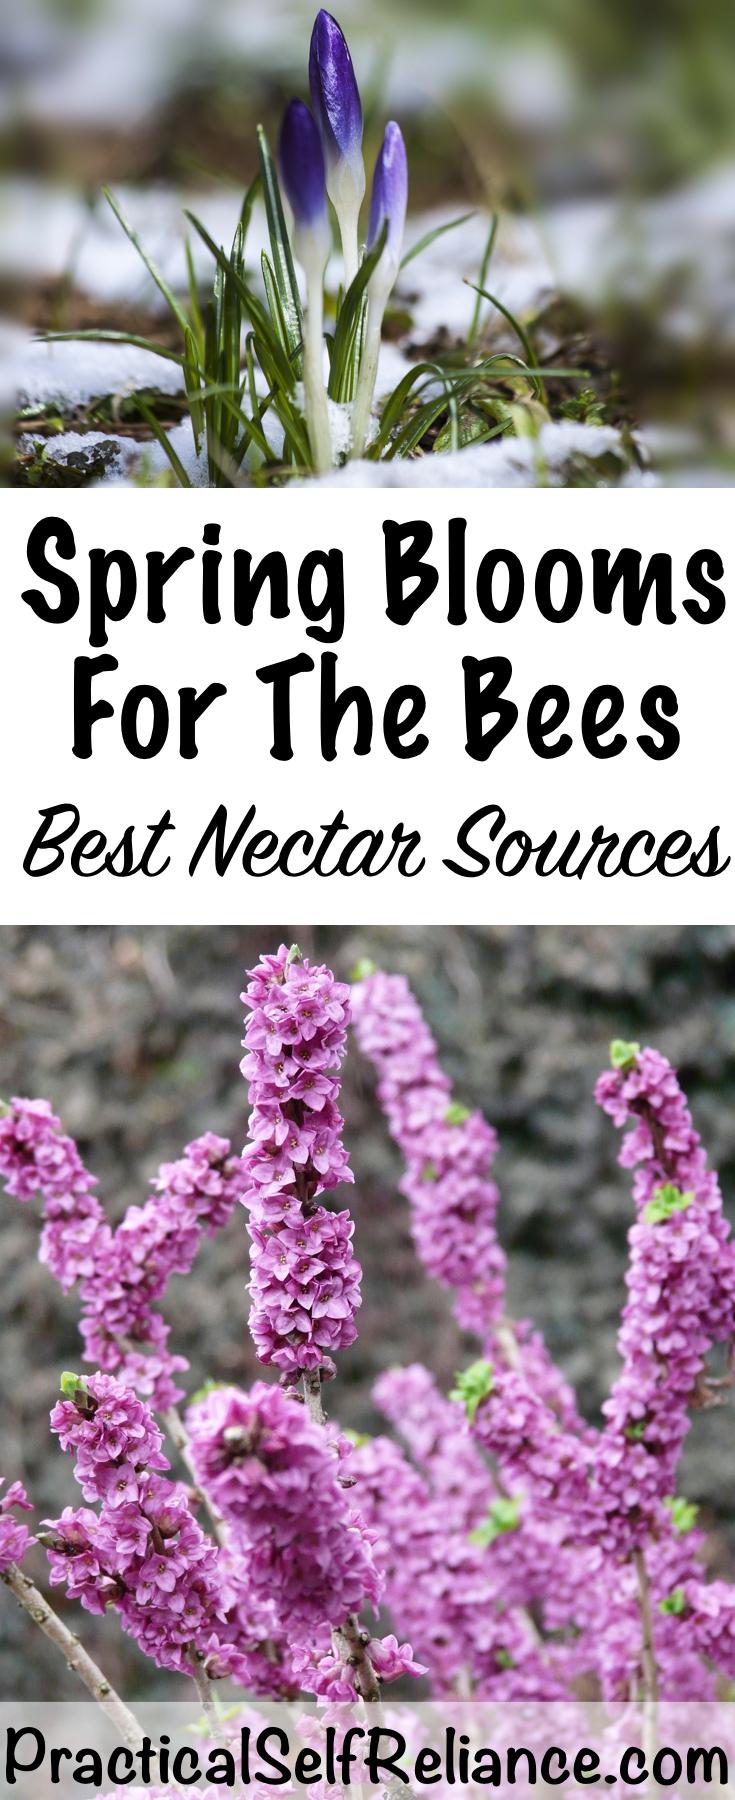 Spring Blooming Flowers for the Bees ~ Planting for Pollinators #growingherbs #springflowers #growingflowers #pollinators #herbs #homesteading #gardening #gardeningtips